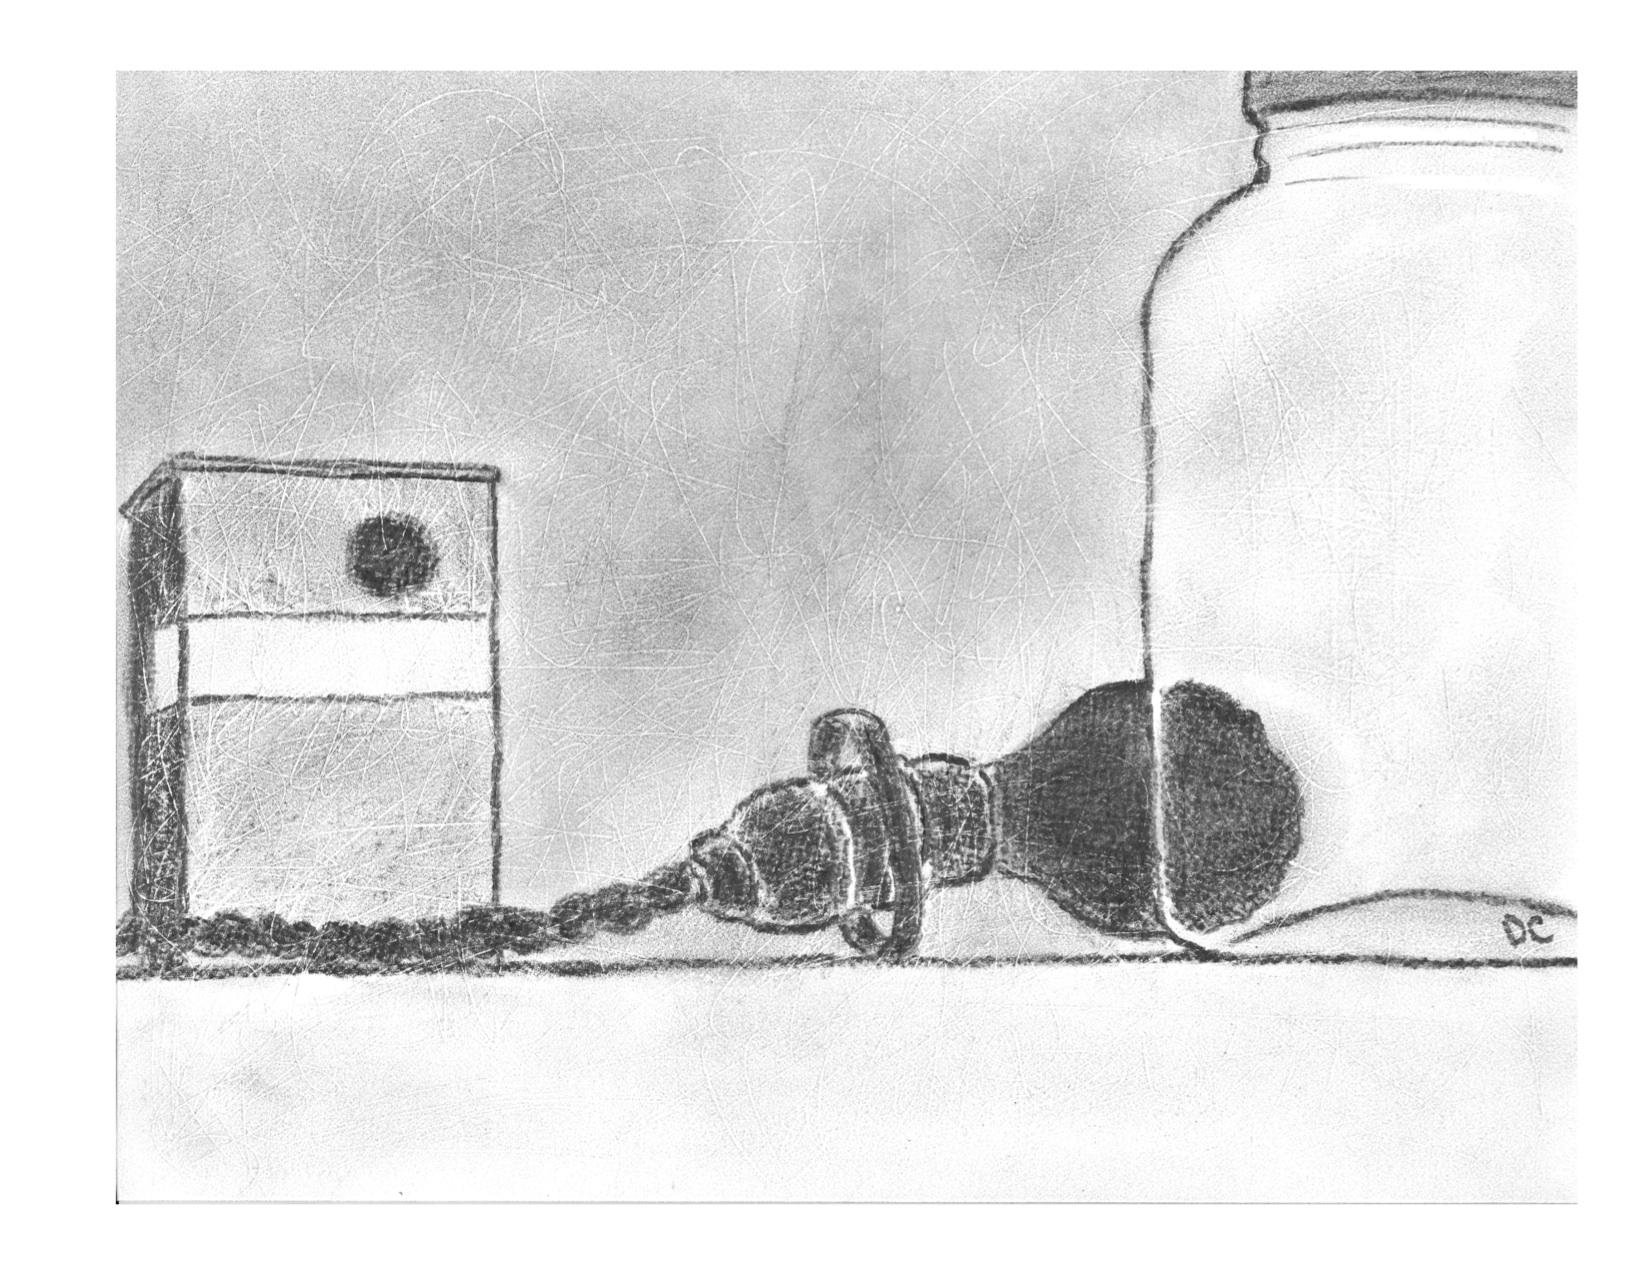 bulb-tin-and-jar-3-jan-1216-pencil-on-paper